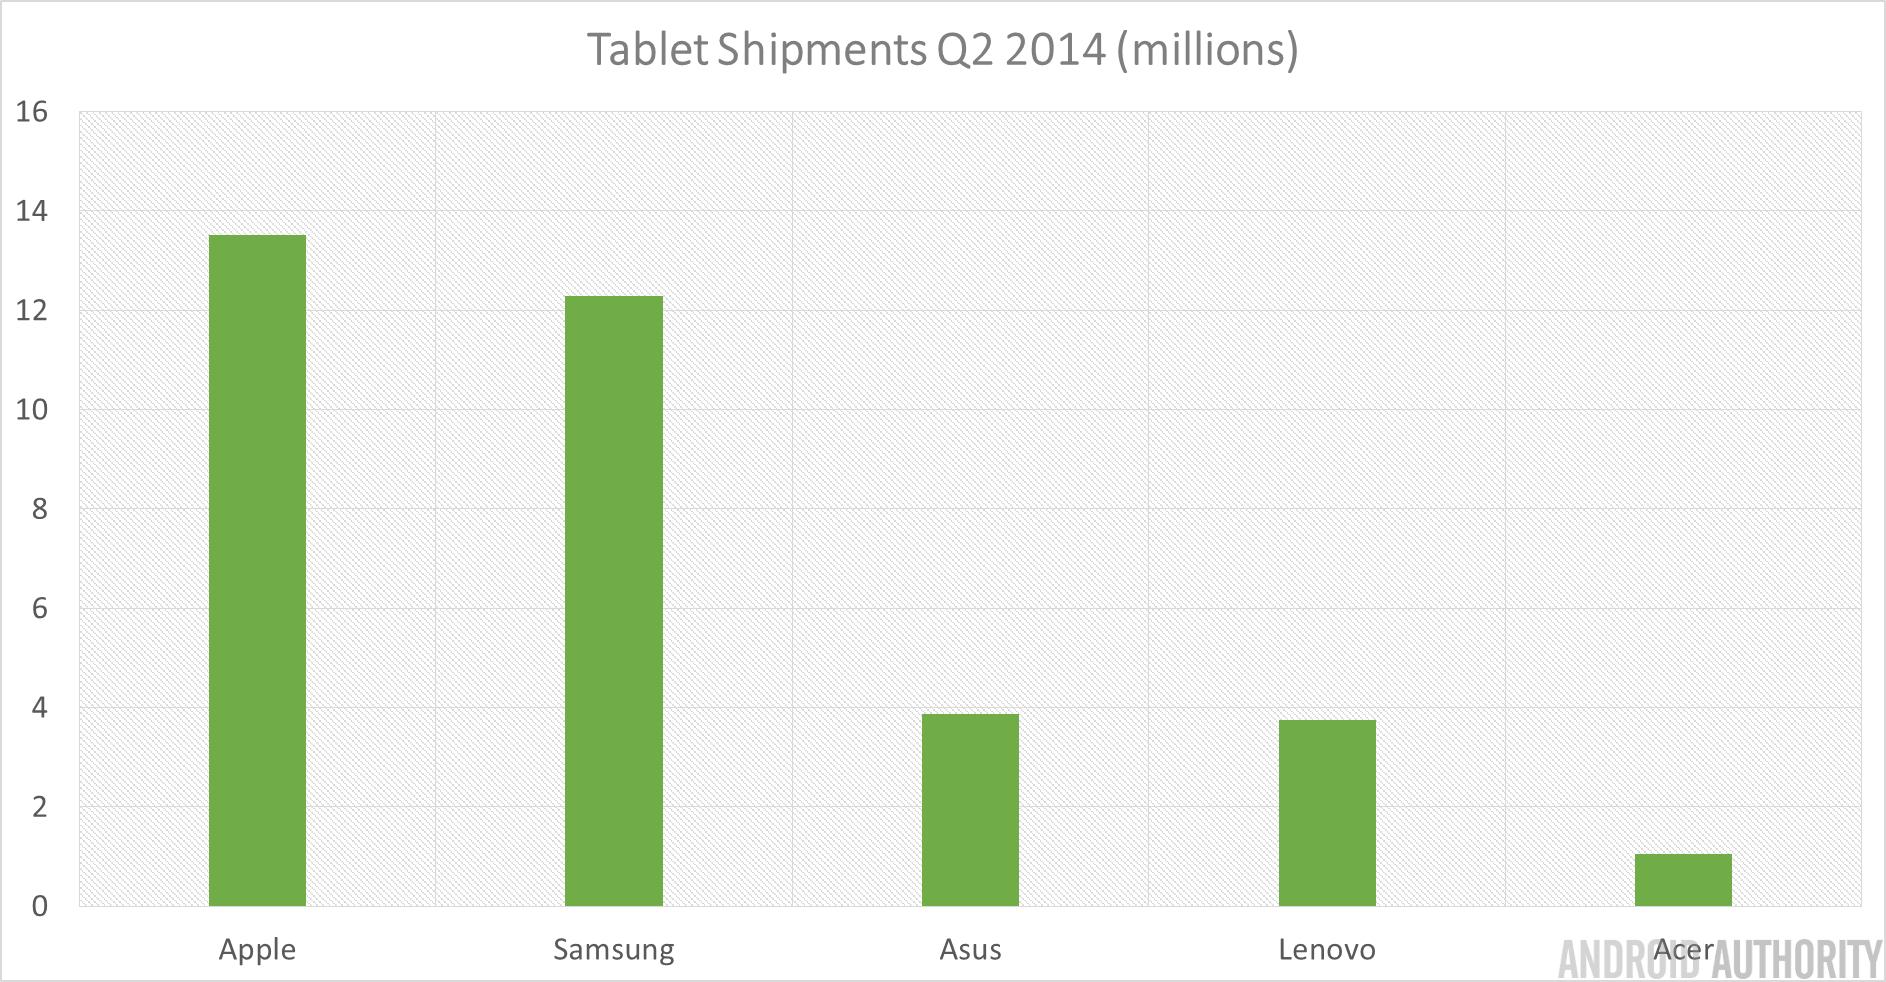 Tablet Shipments Q2 2014